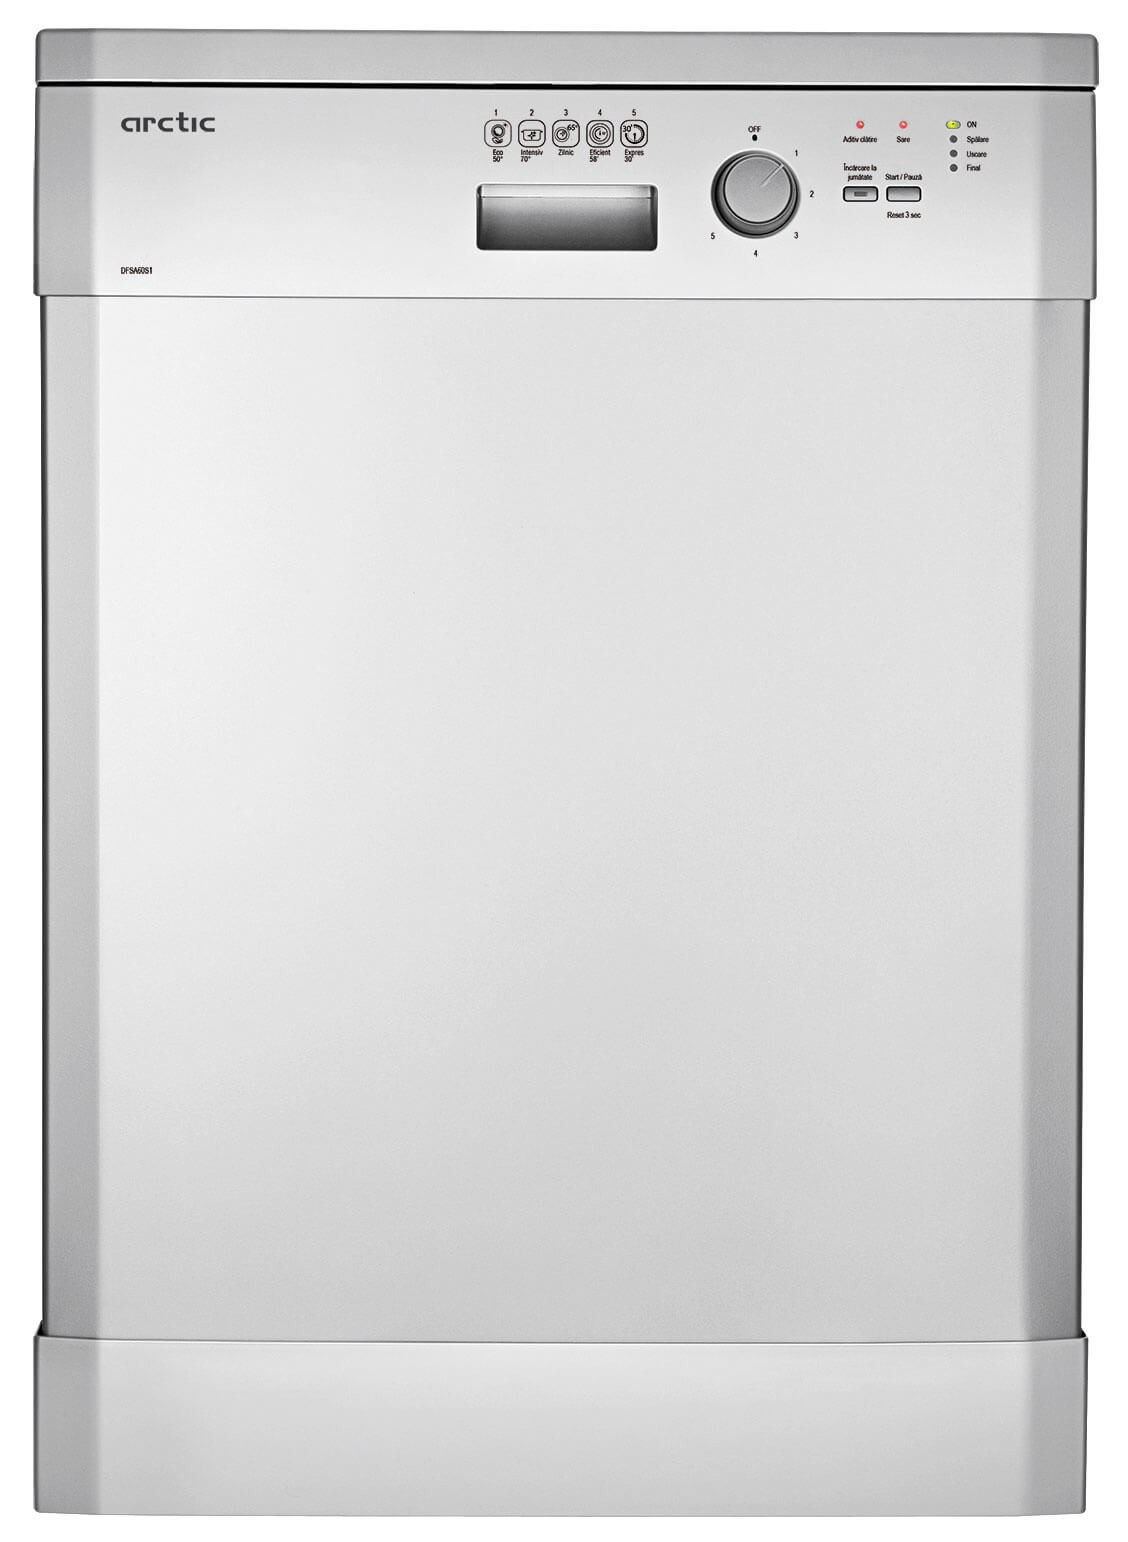 Masina de spalat vase DFSA60S1